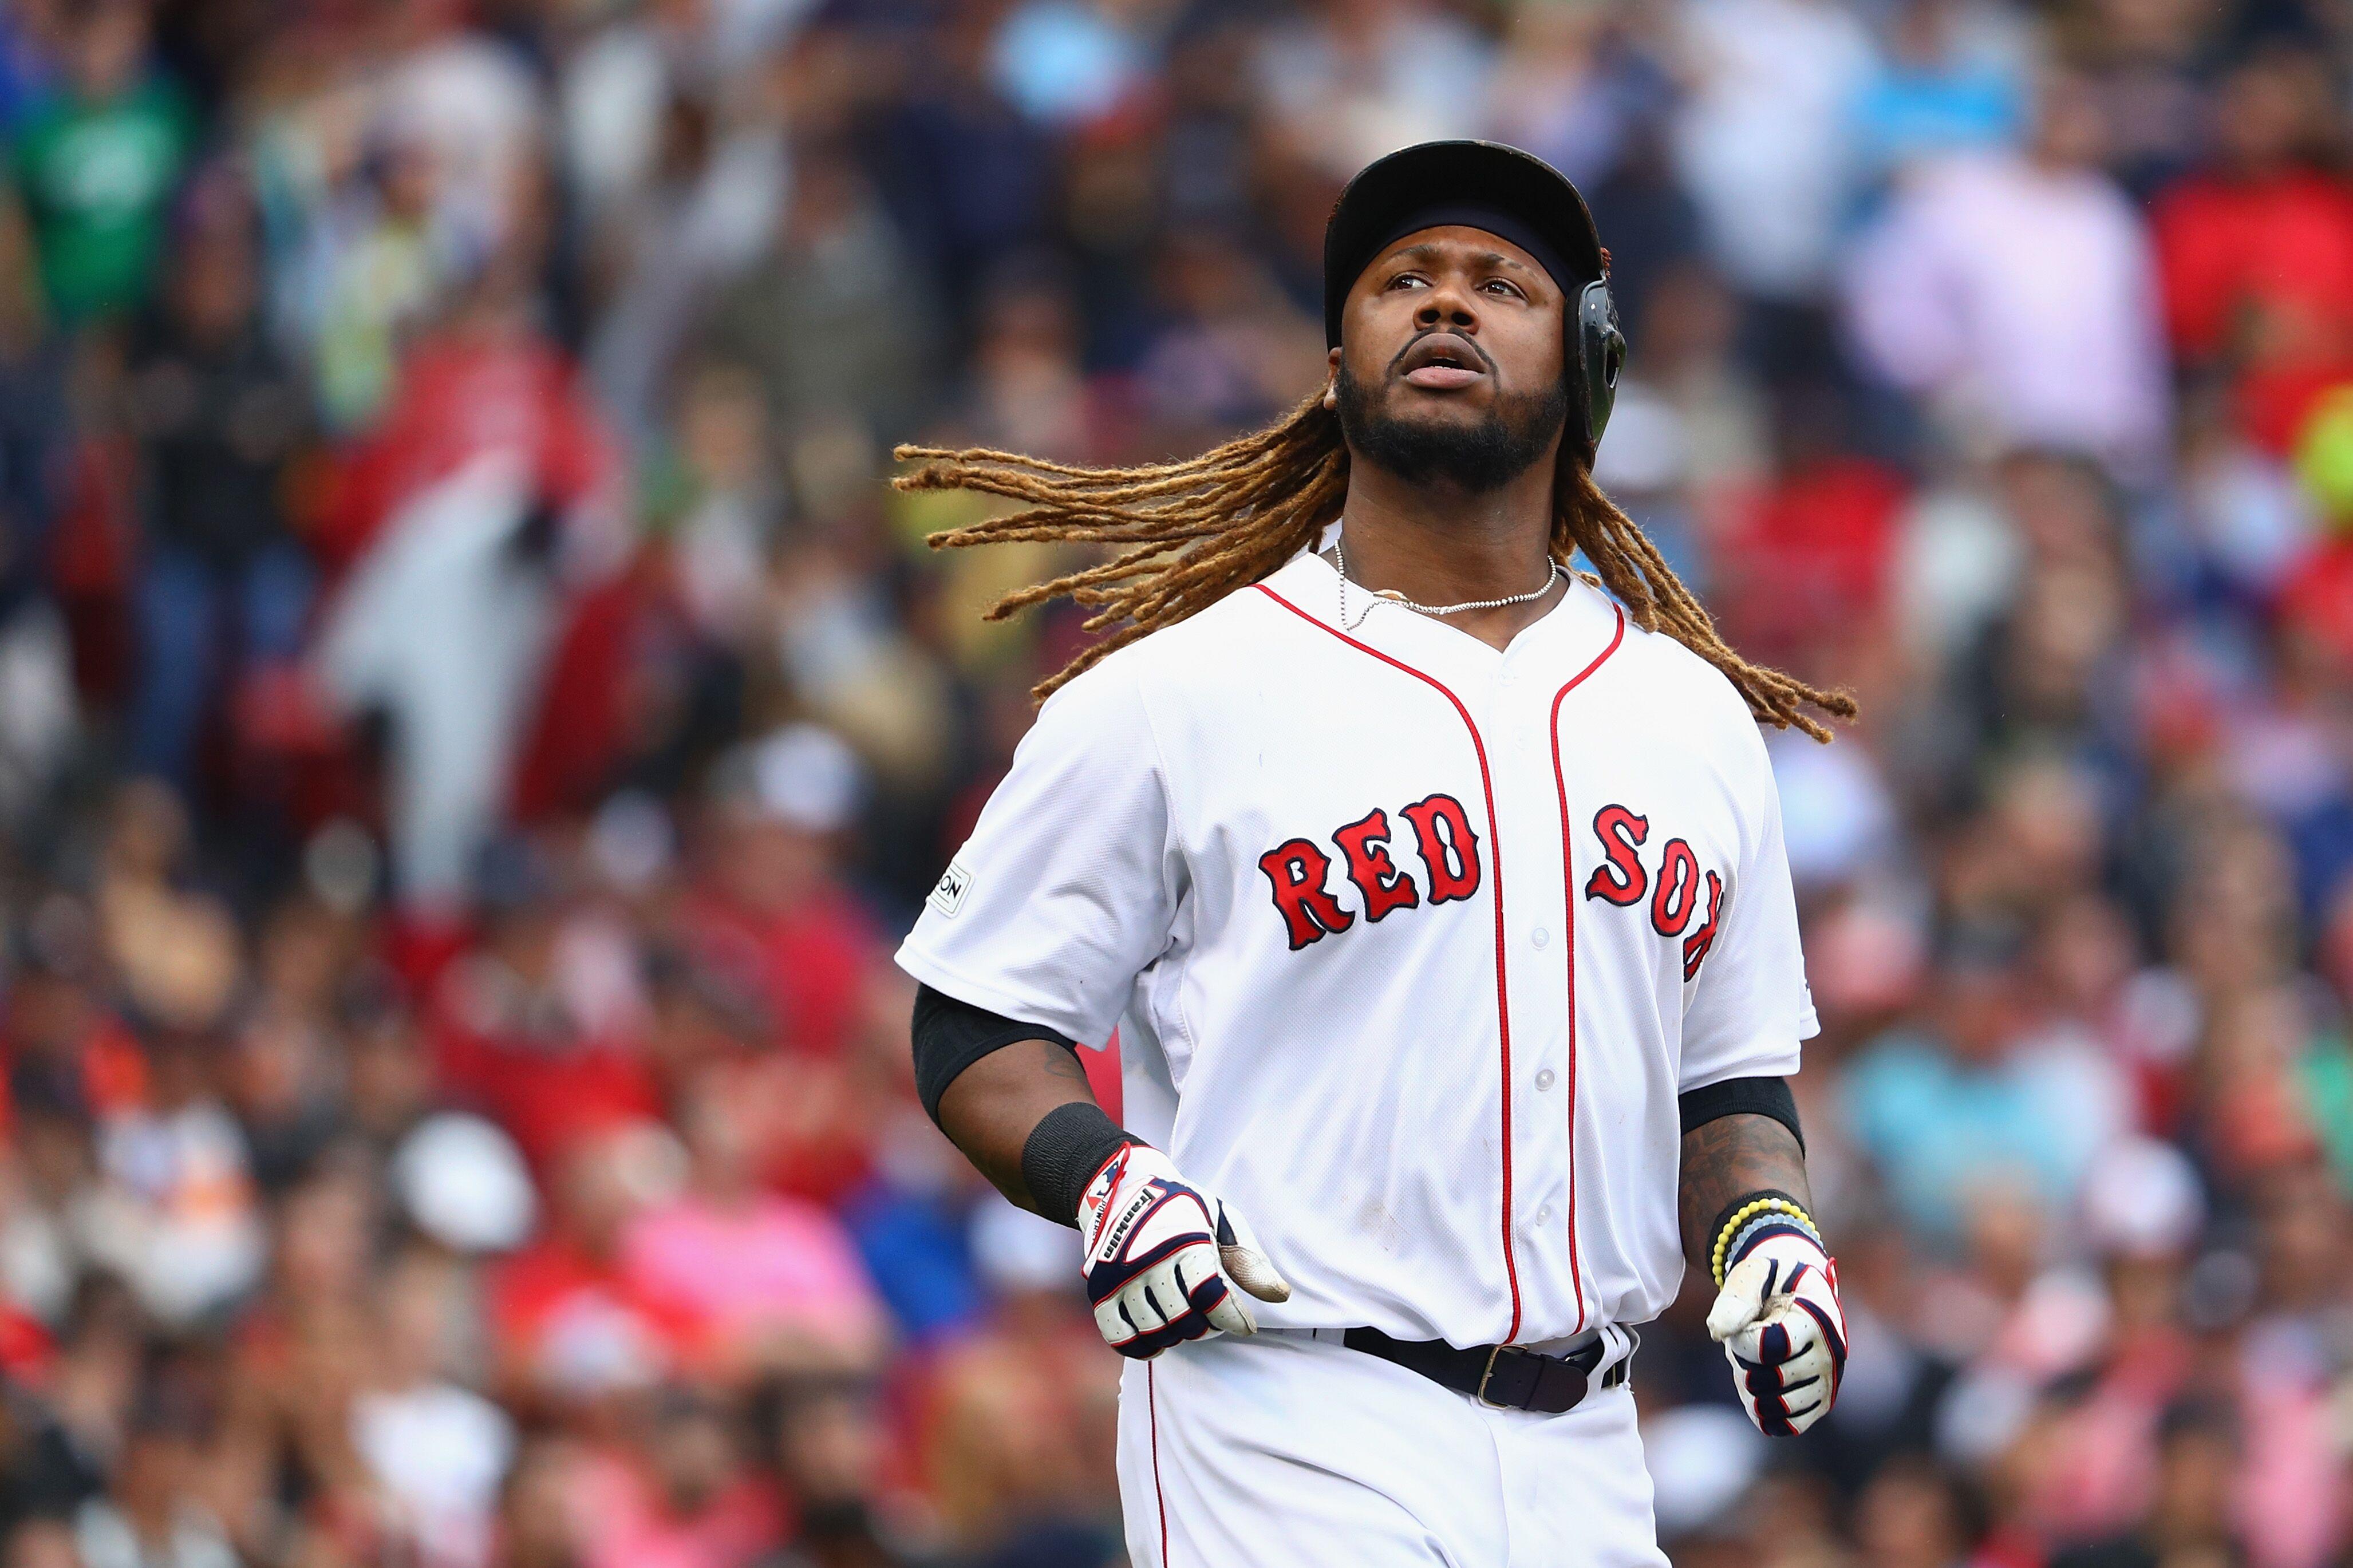 859483696-divisional-round-houston-astros-v-boston-red-sox-game-four.jpg